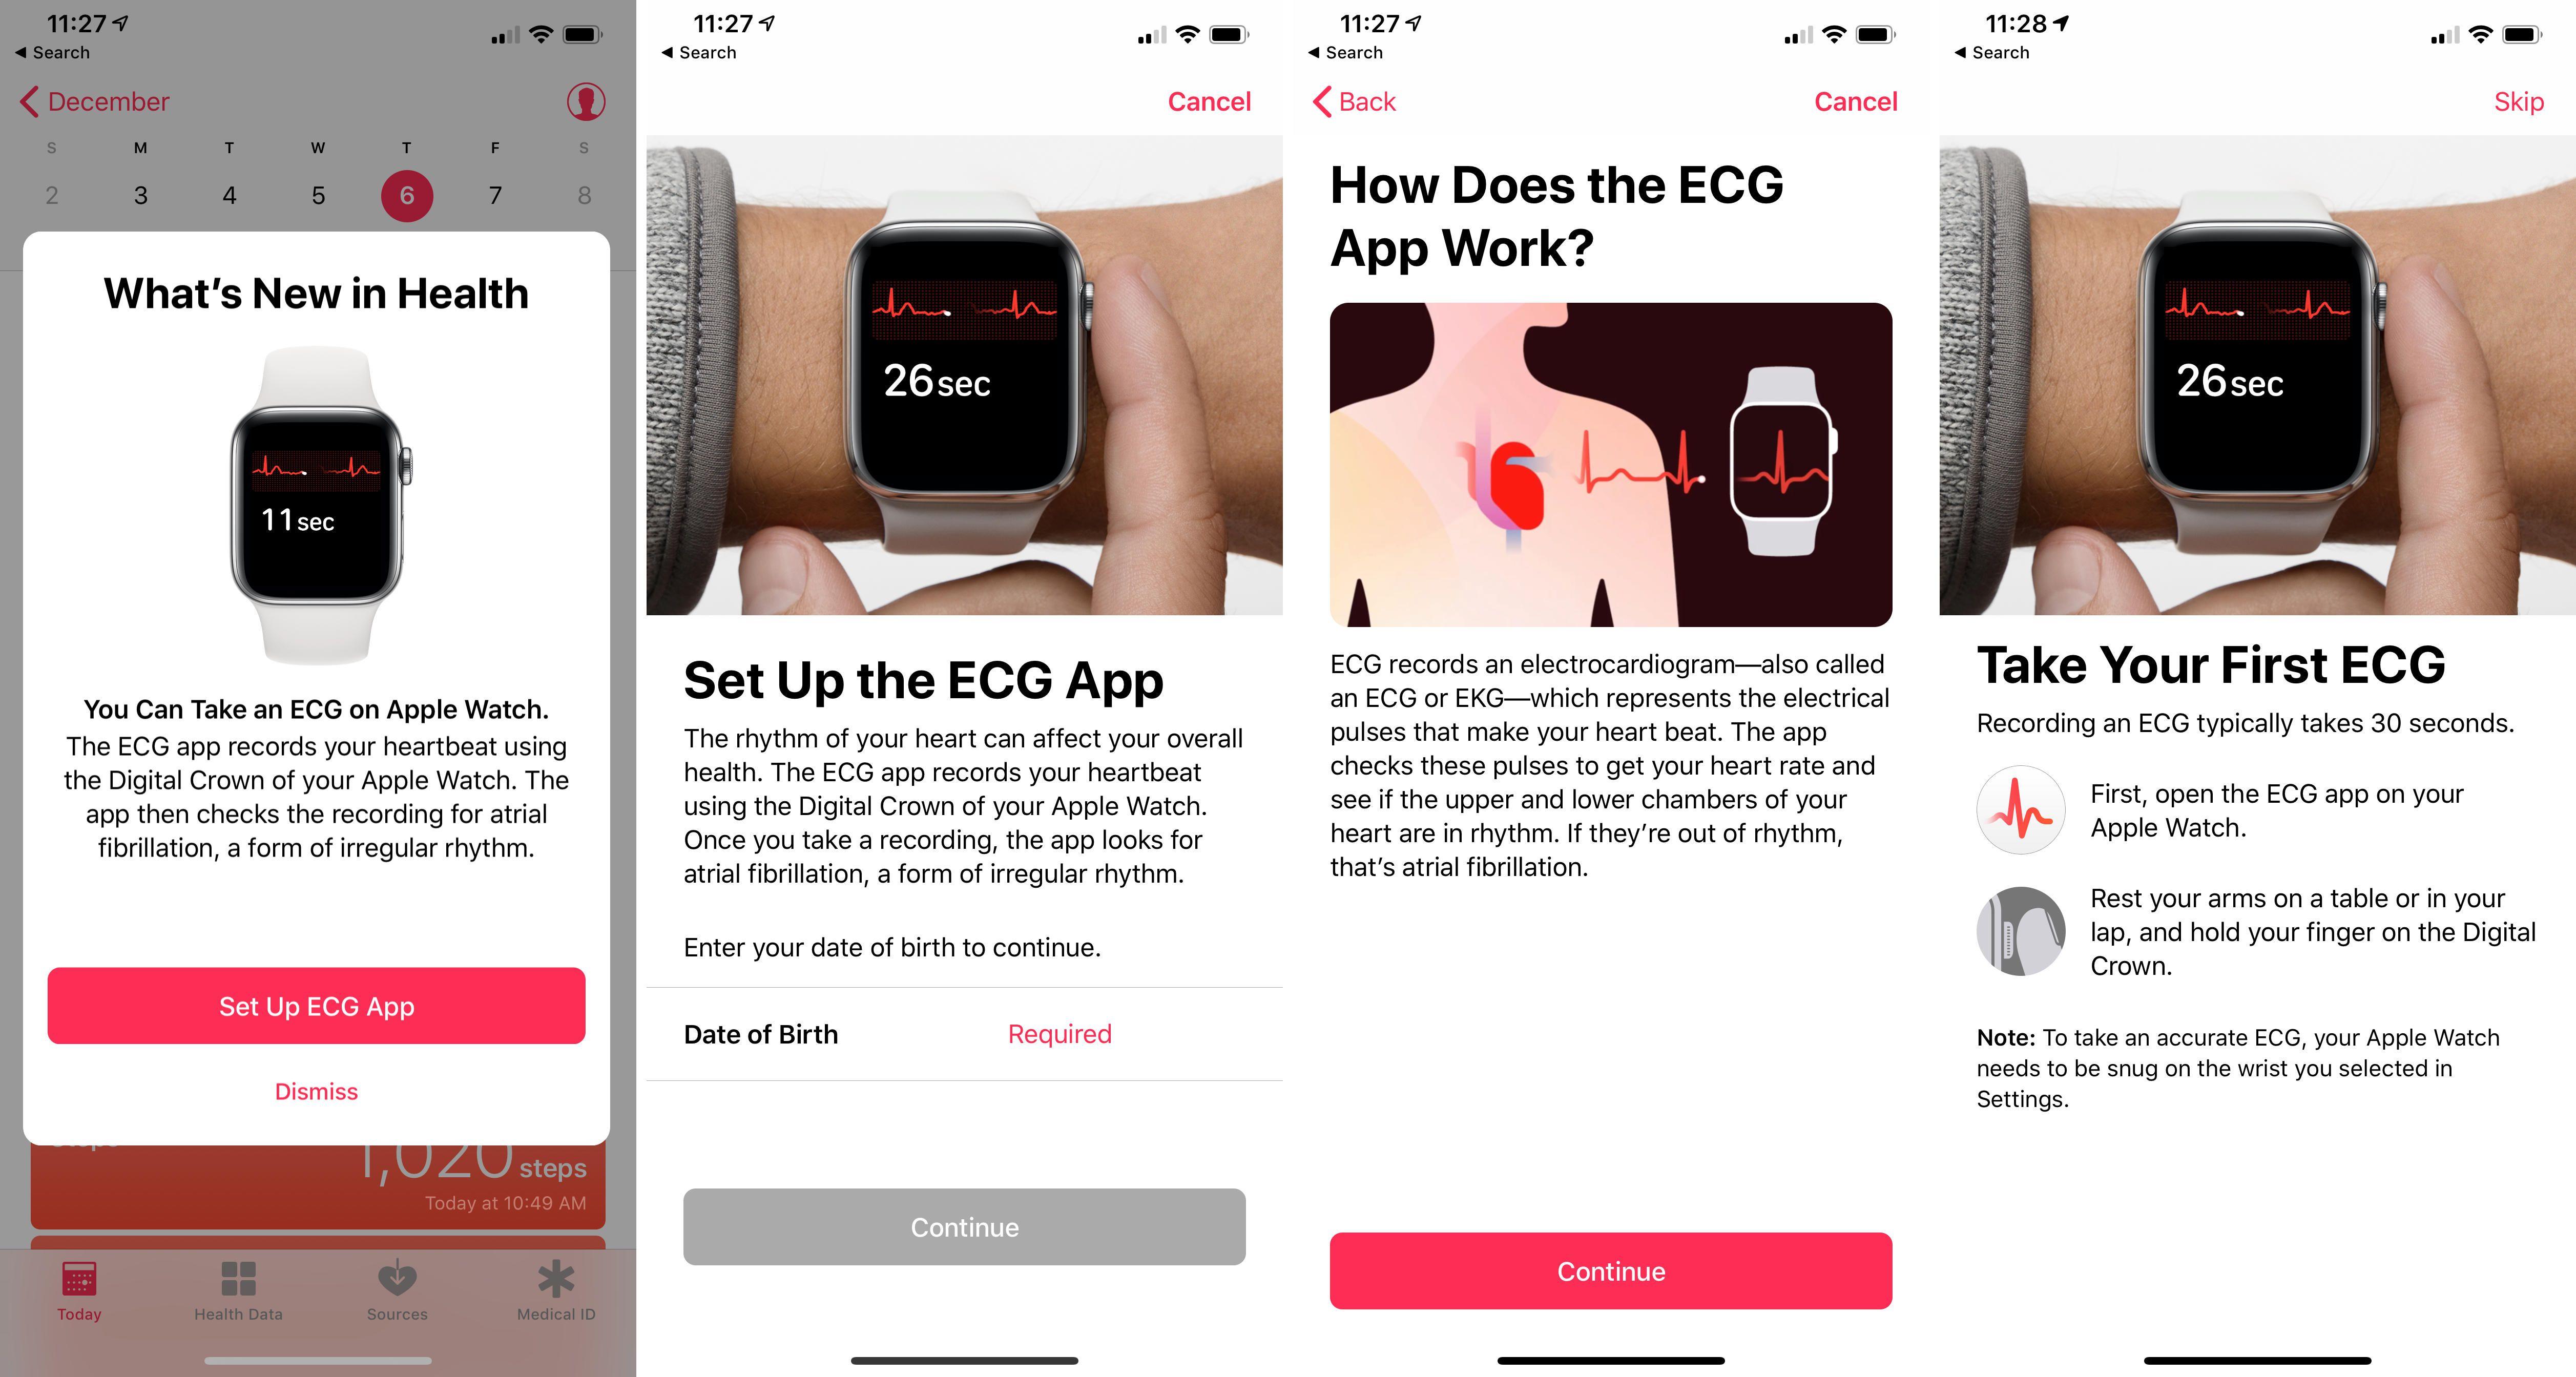 apple-watch-ecg-setup-health-app